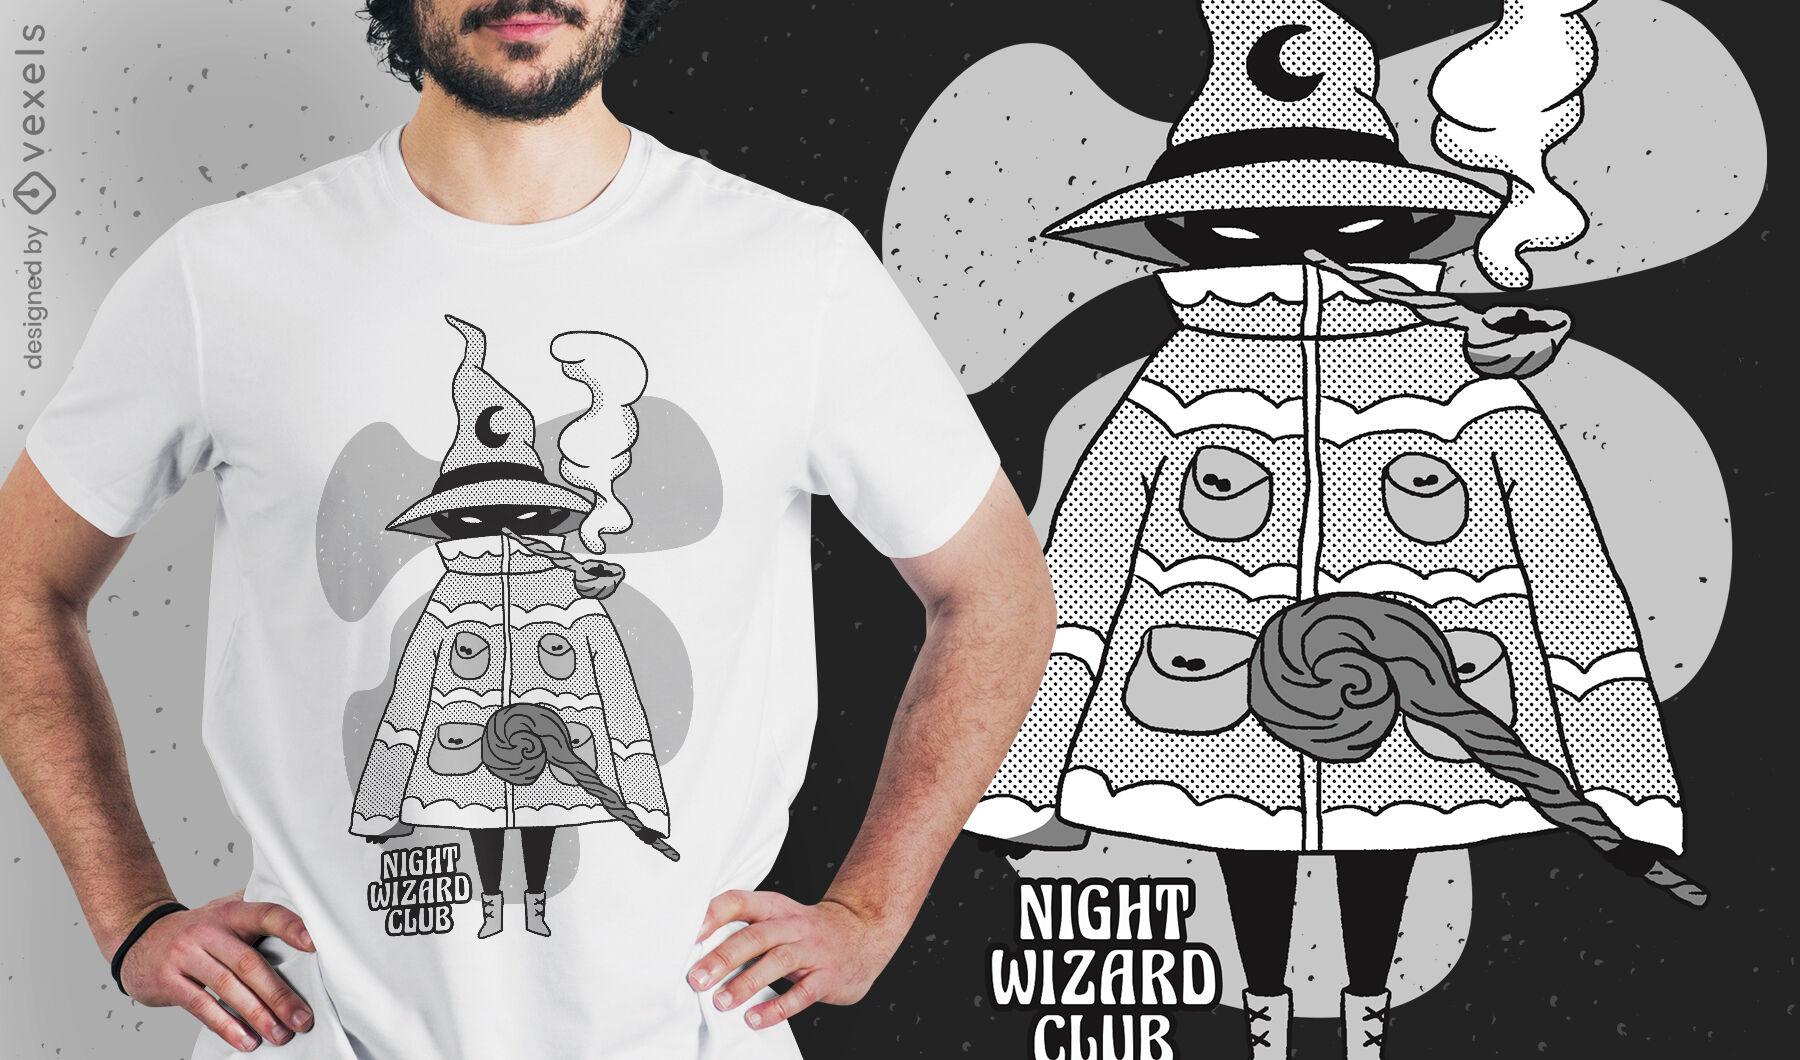 Evil cartoon wizard fantasy t-shirt design